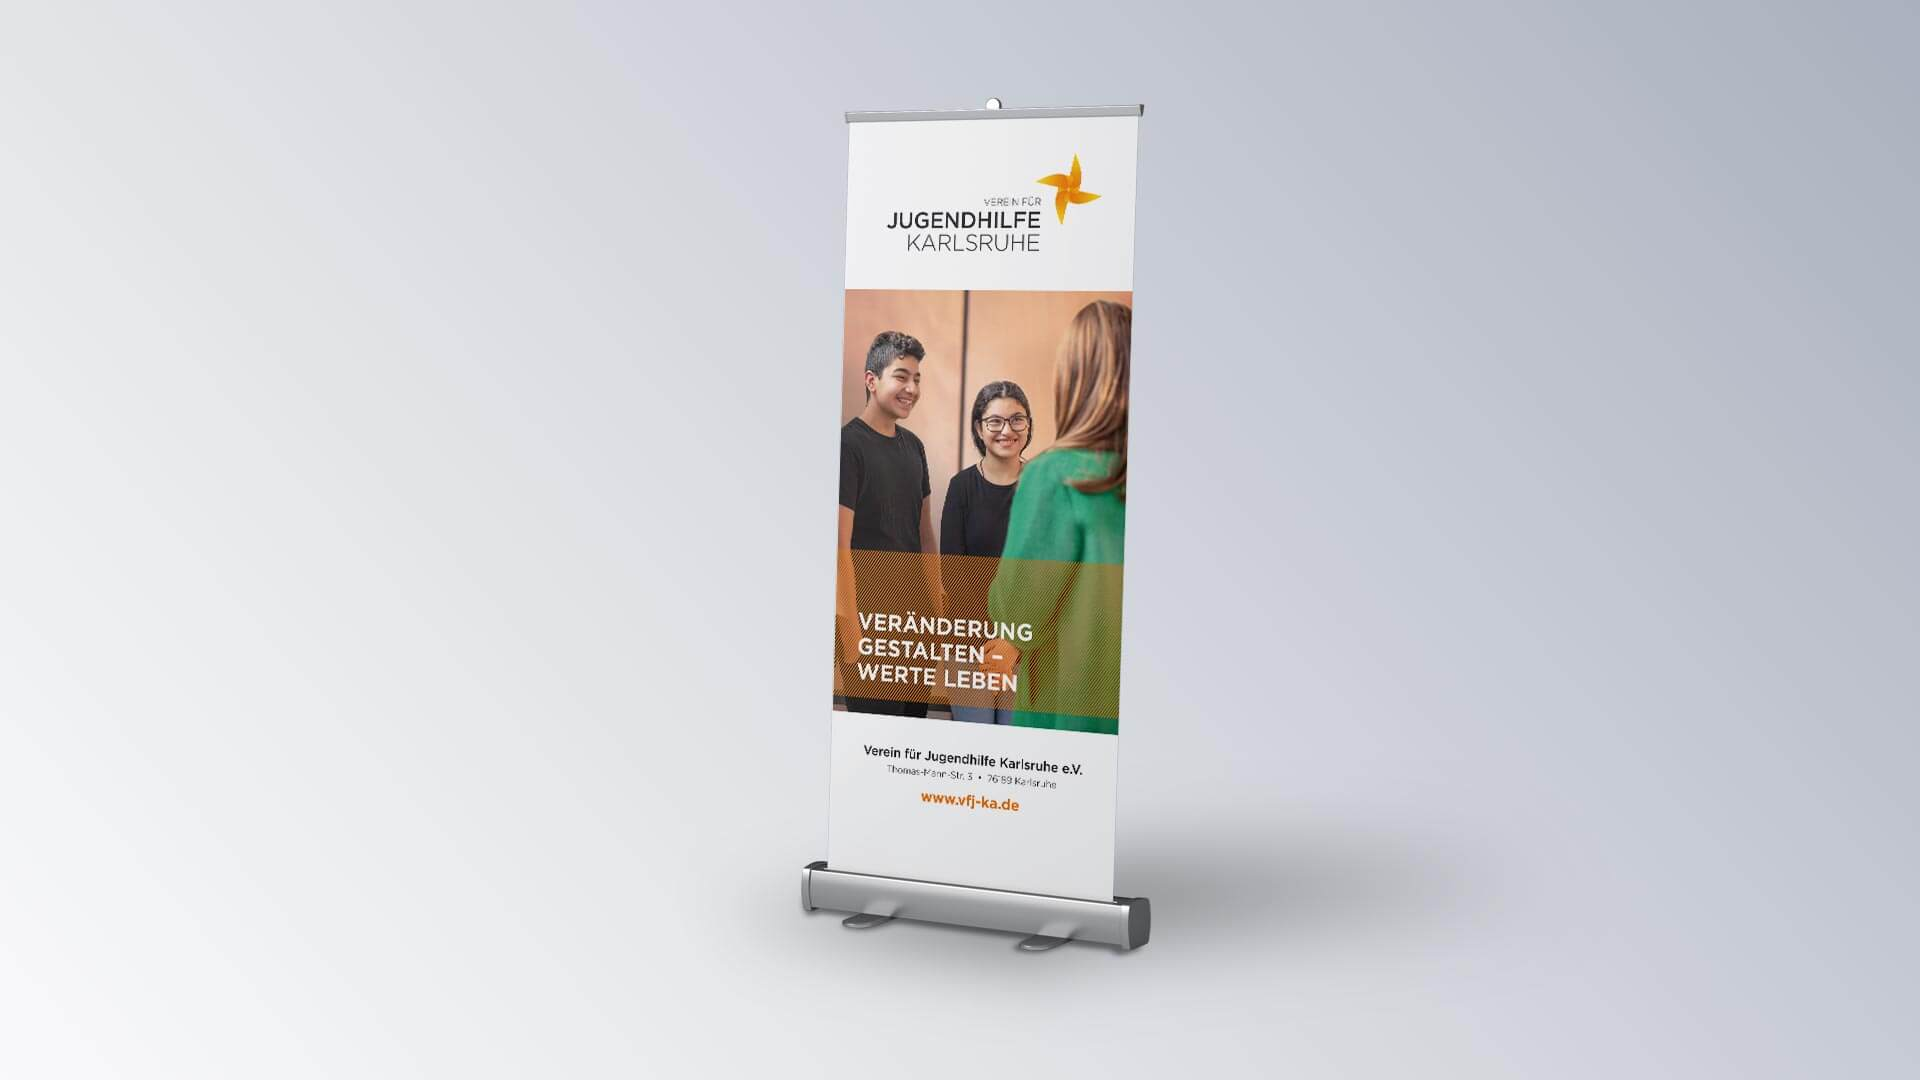 Verein für Jugendhilfe Karlsruhe e.V. Rollup